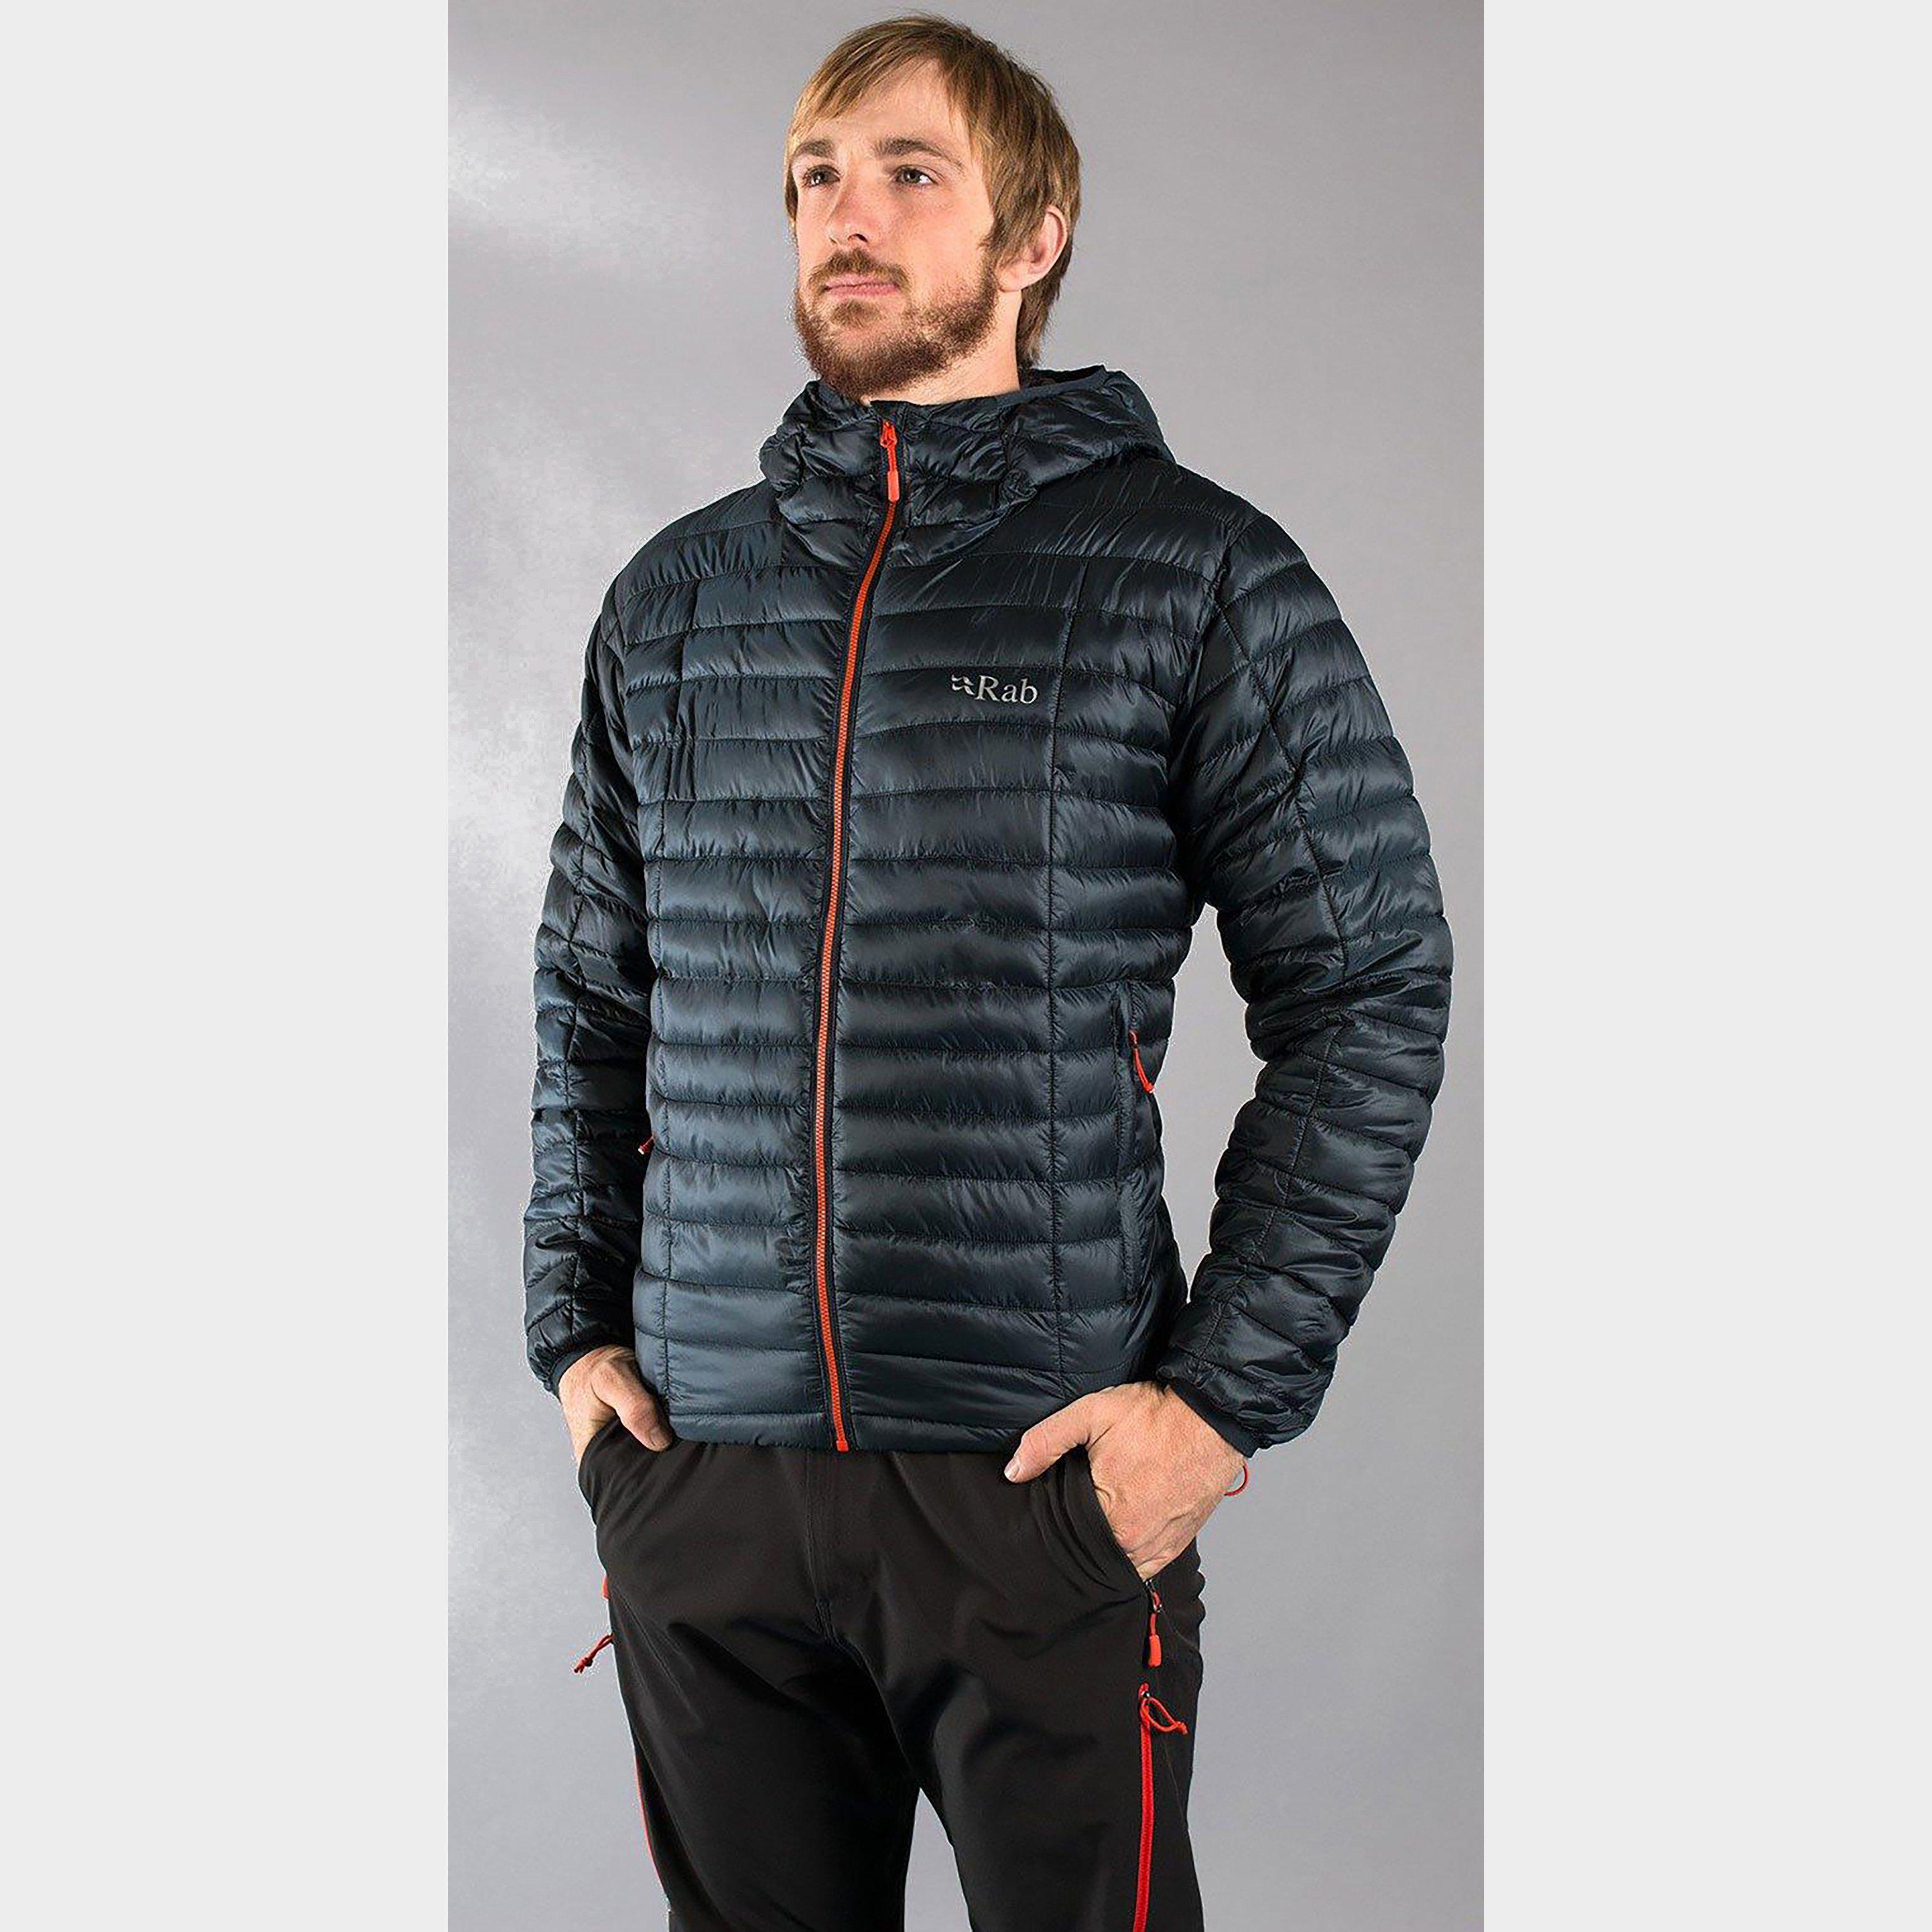 RAB Men's Nimbus Insulated Jacket